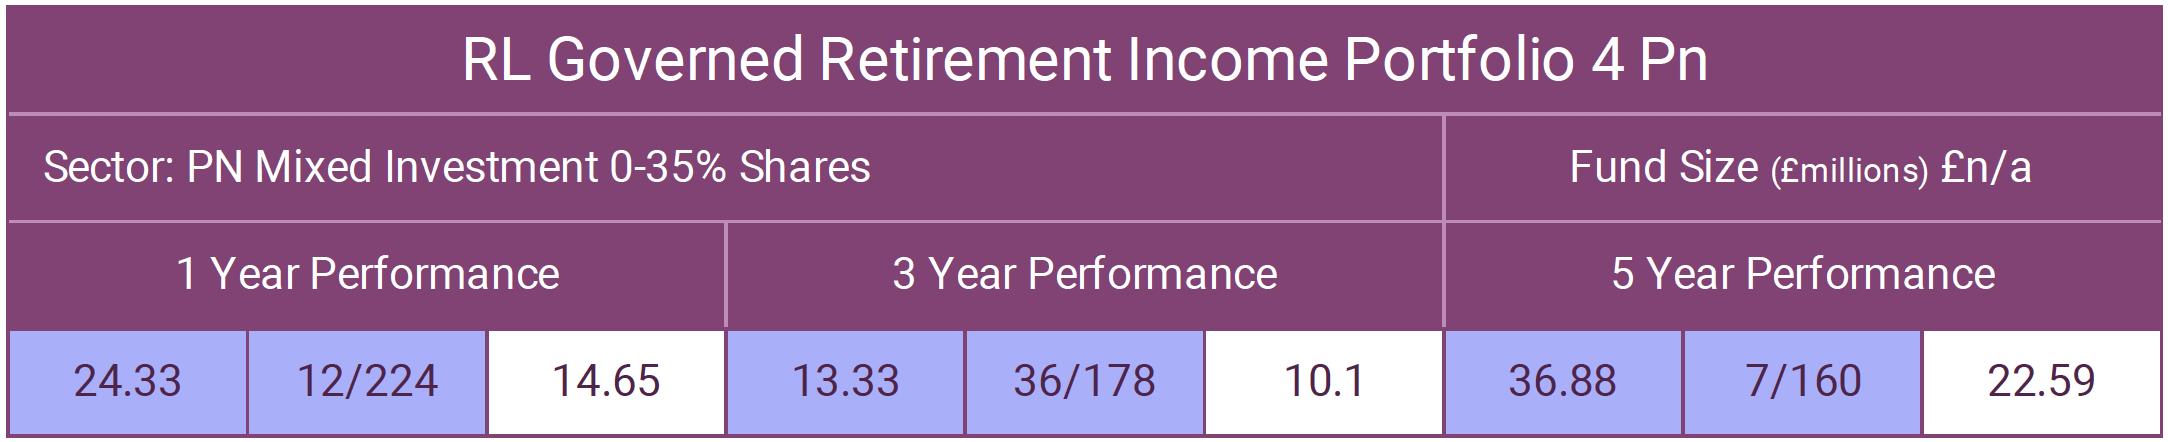 RL Governed Retirement Income Portfolio 4